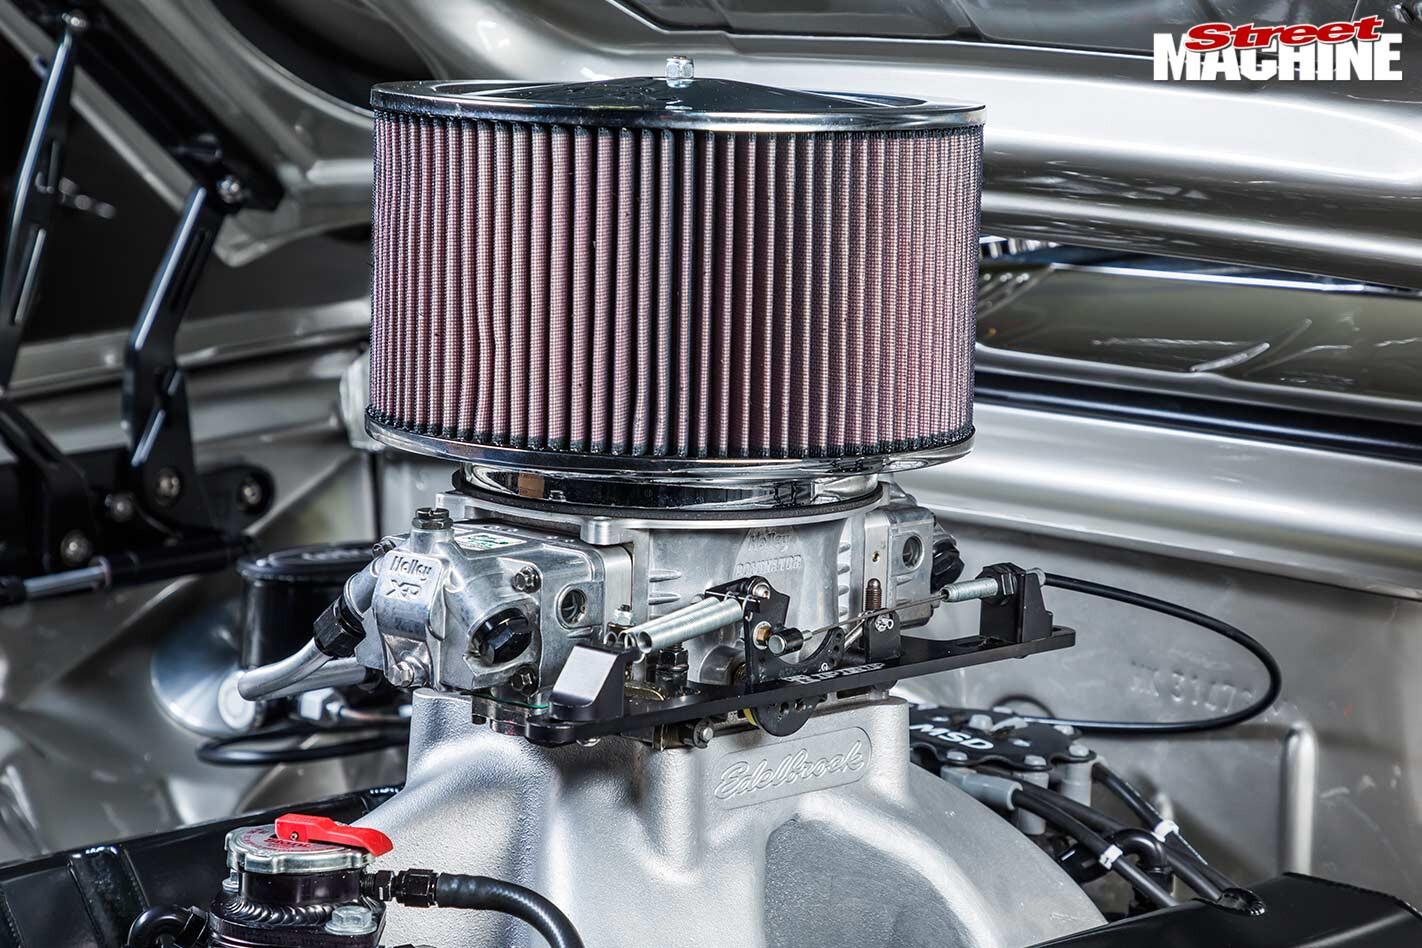 Holden HK Monaro GTS engine